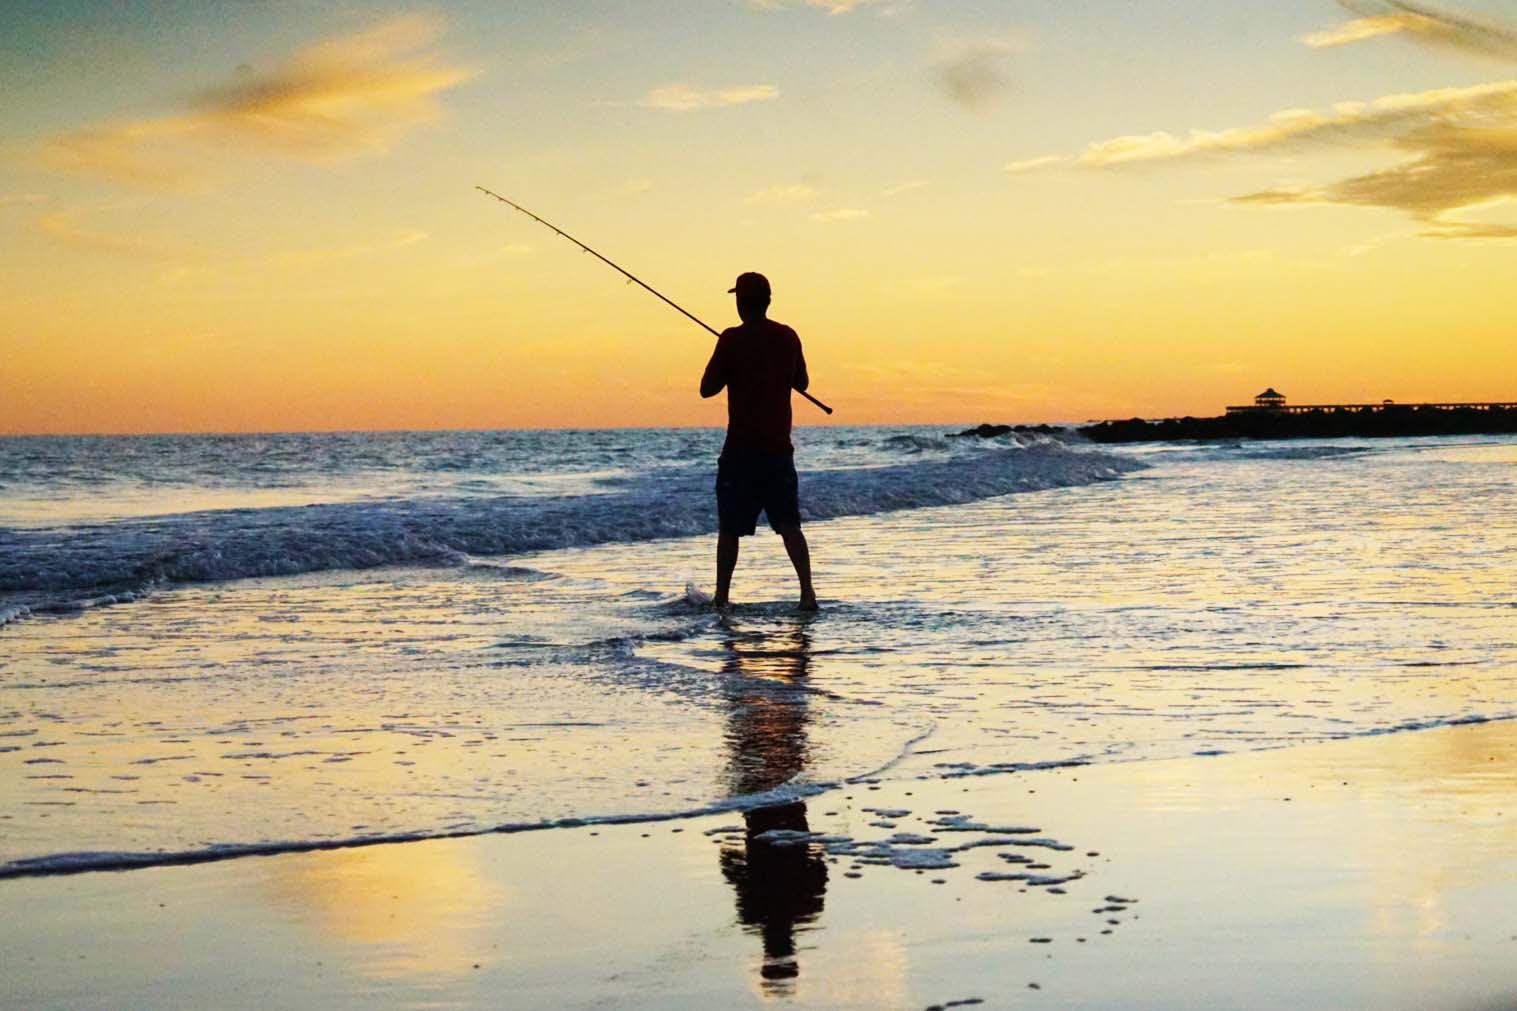 shore fishing